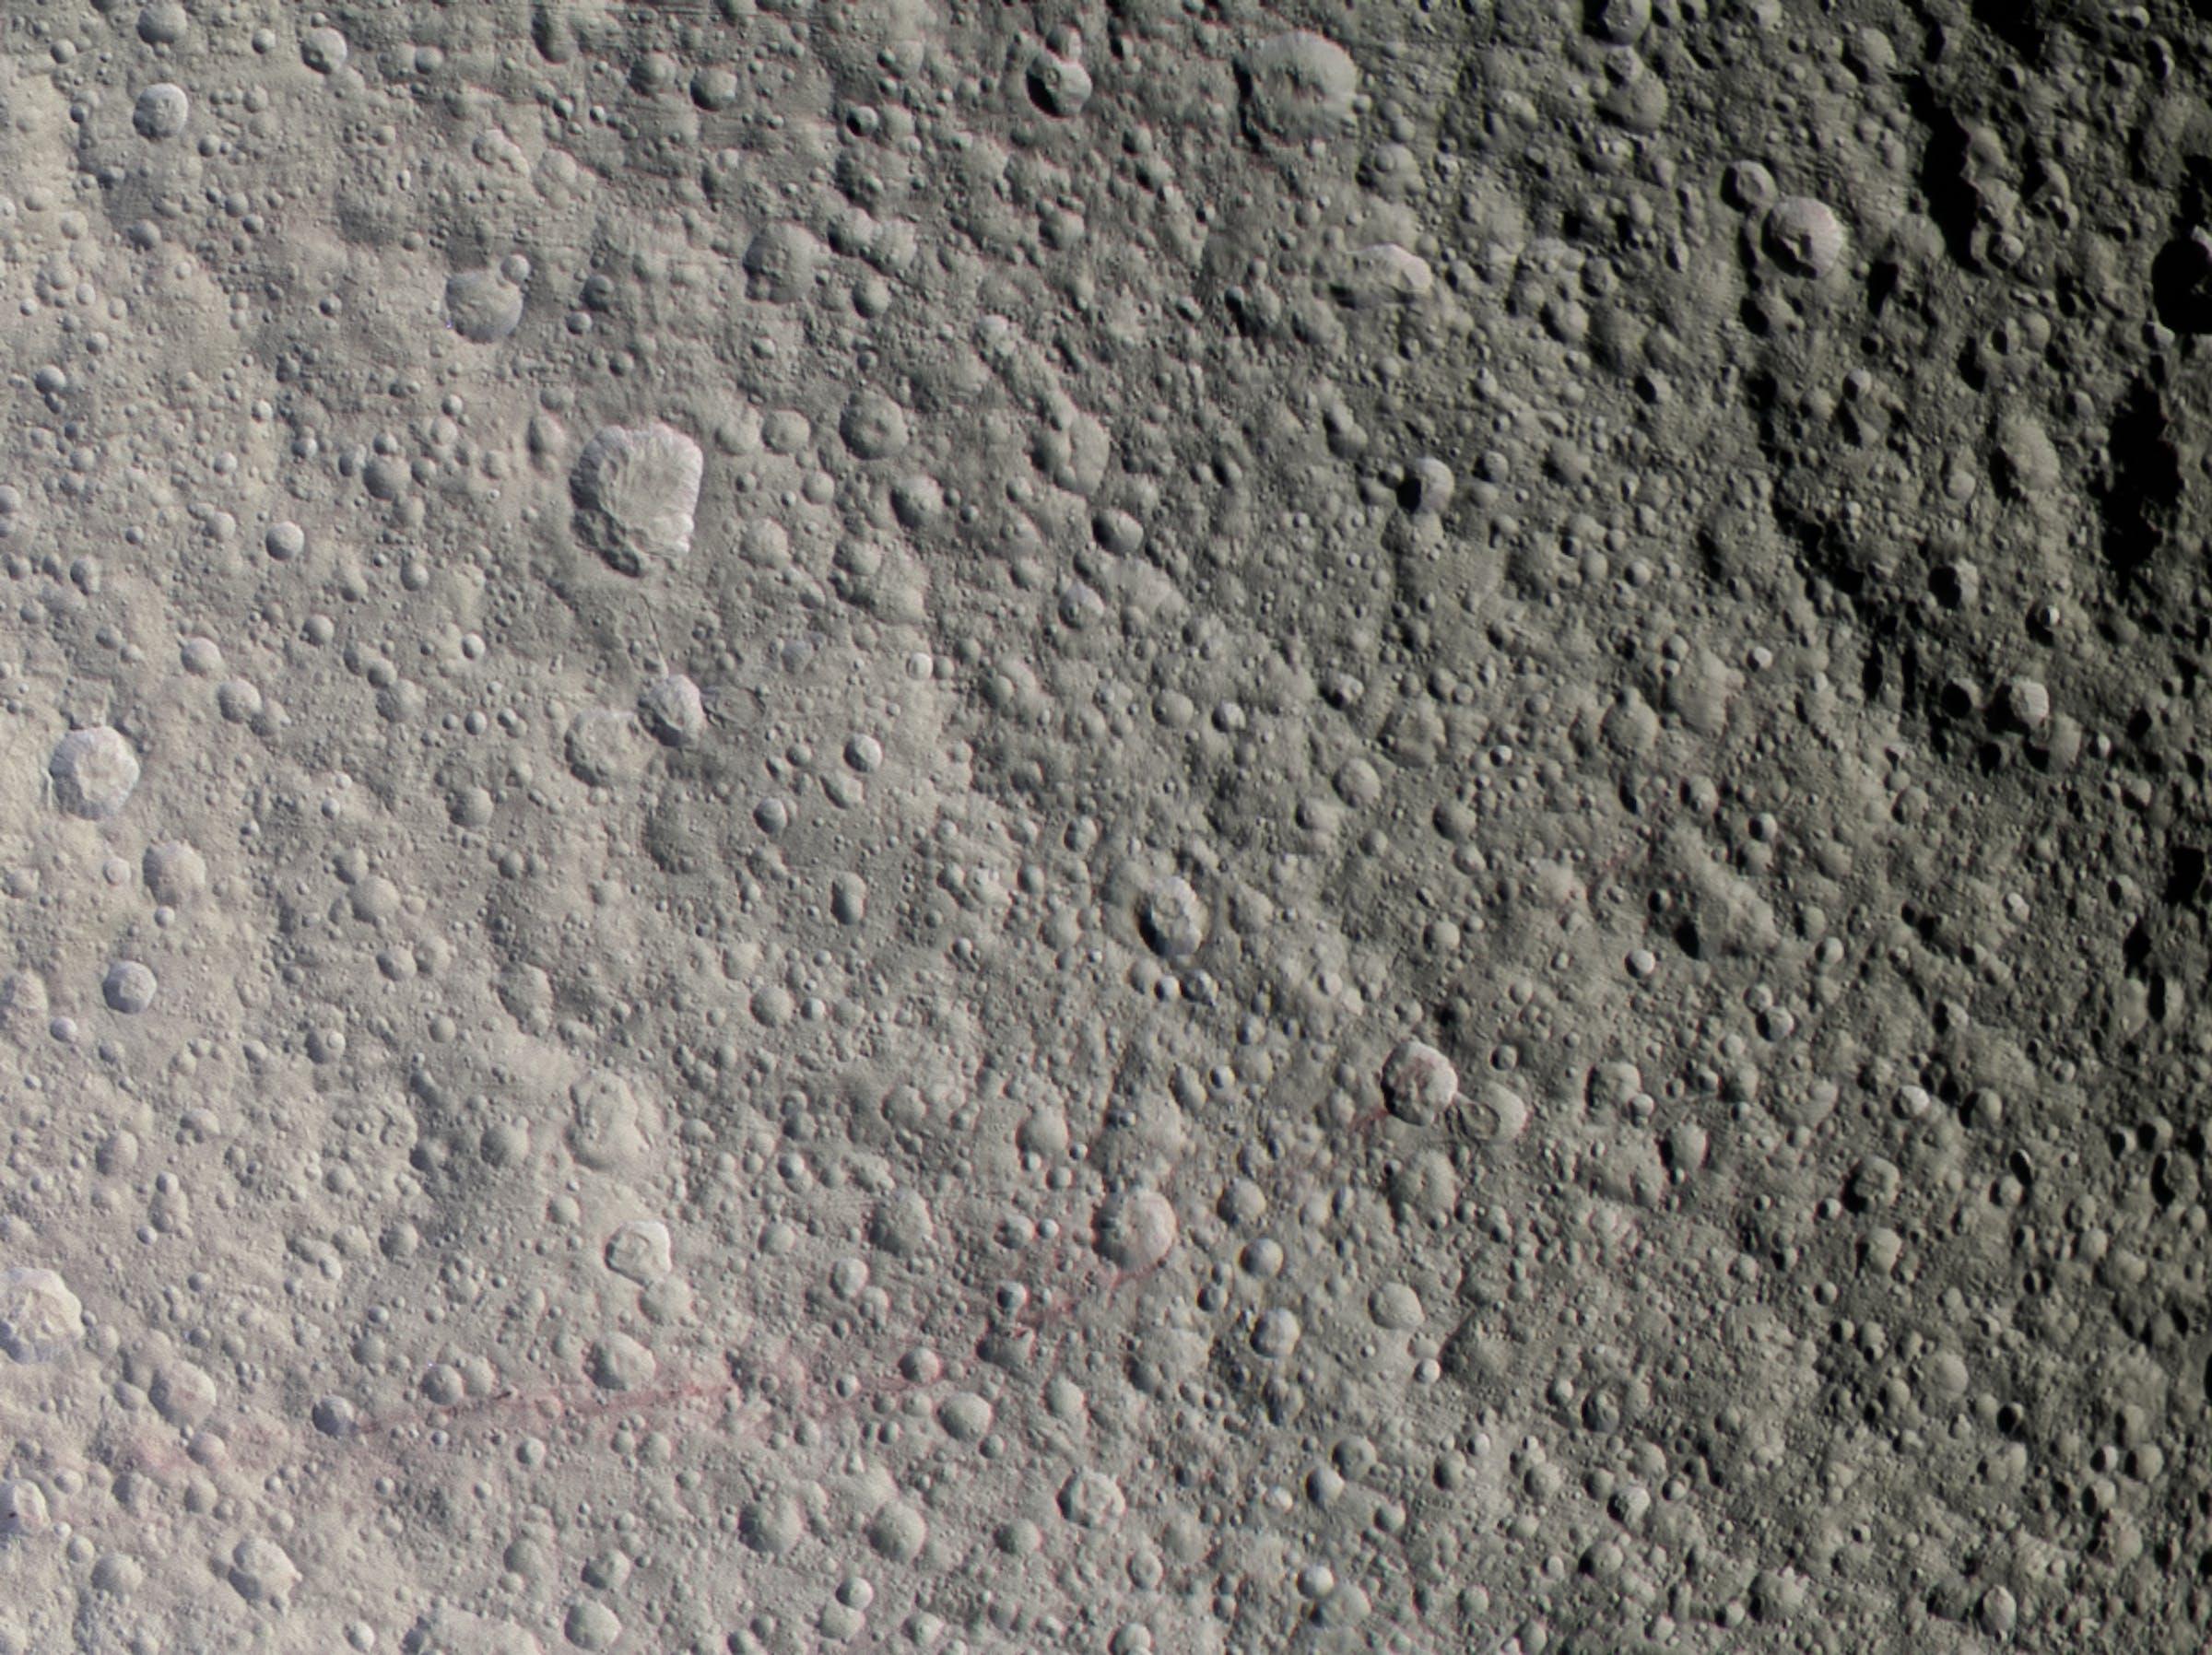 The Red Streaks of Tethys - November 23 2015